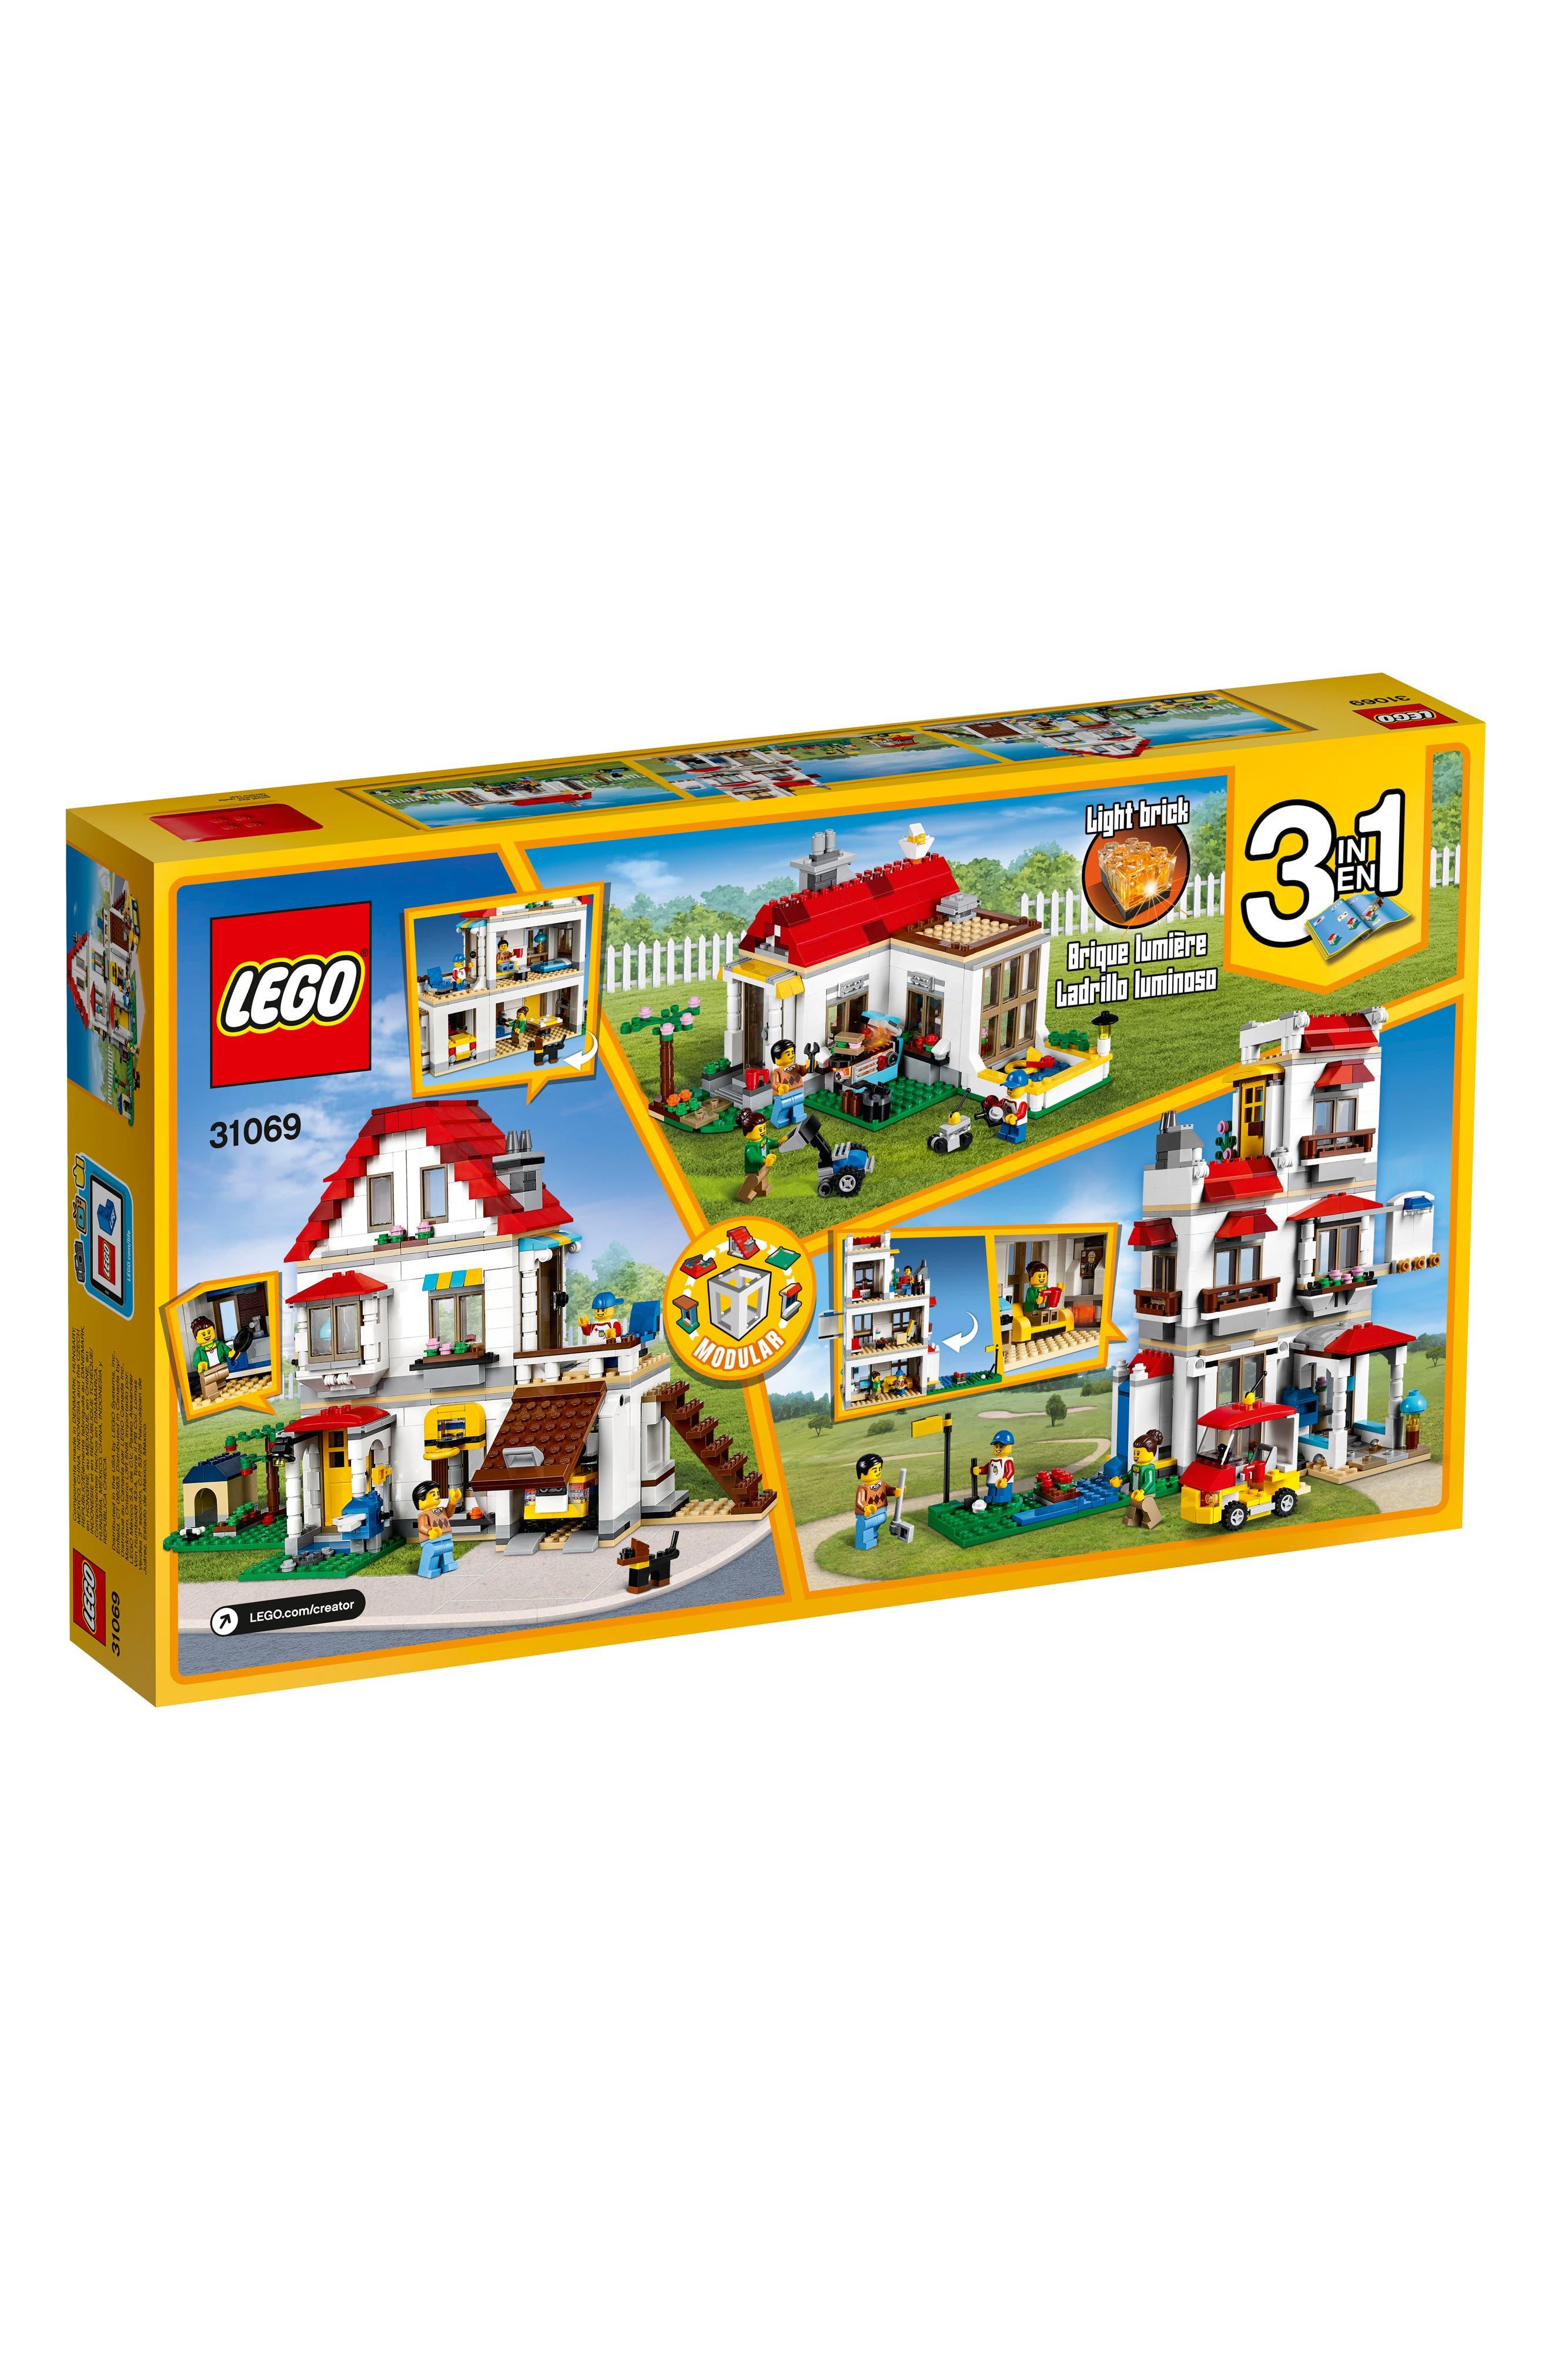 Creator Modular Family Villa Play Set - 31069,                             Main thumbnail 1, color,                             100